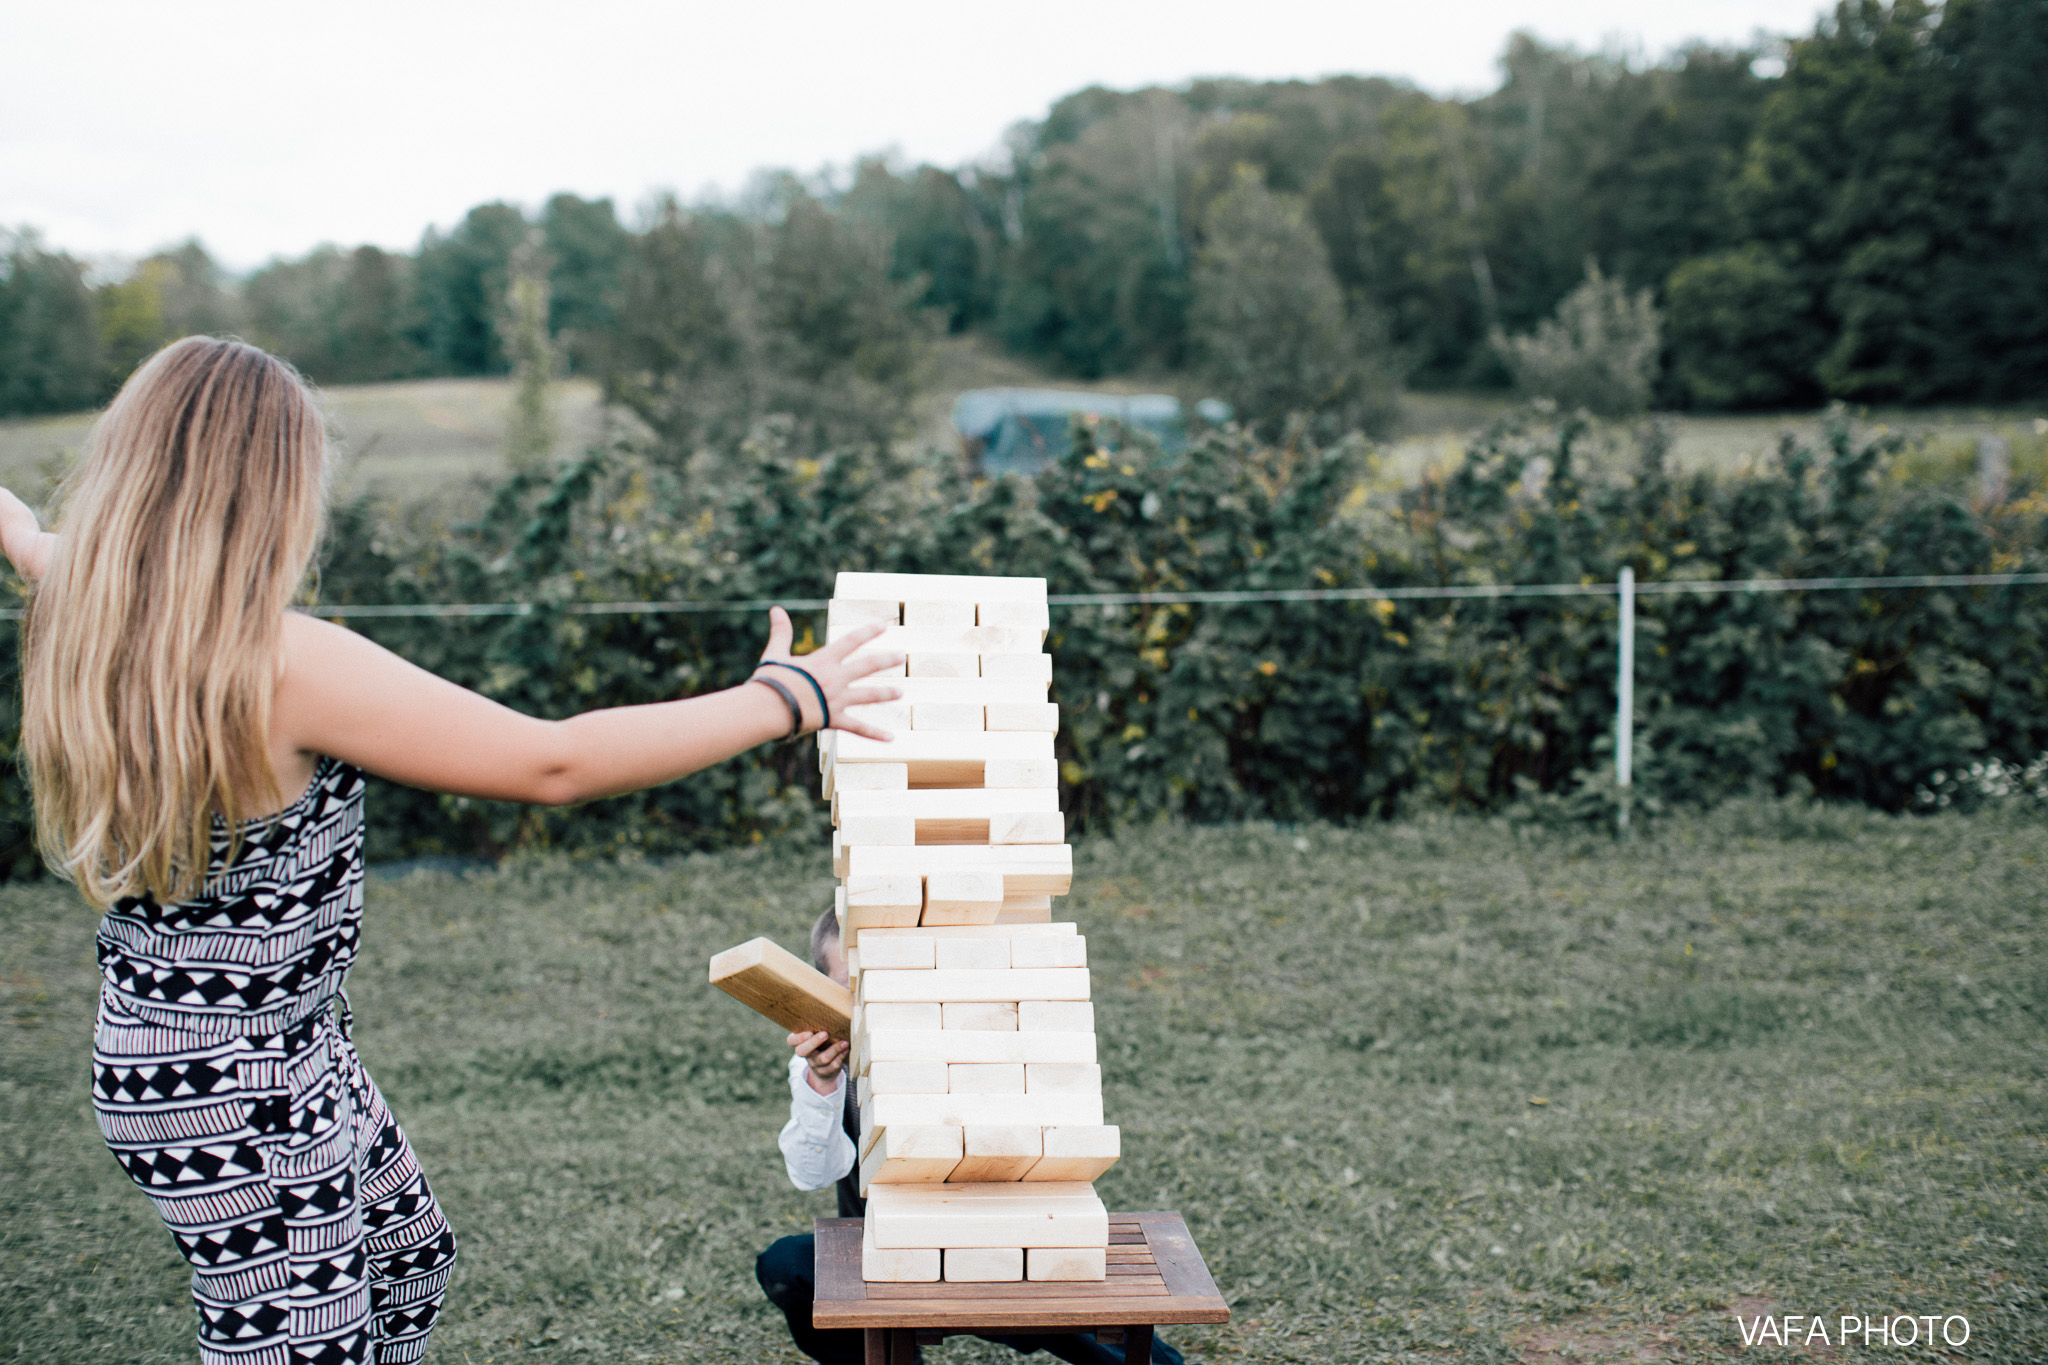 Belsolda-Farm-Wedding-Christy-Eric-Vafa-Photo-542.jpg